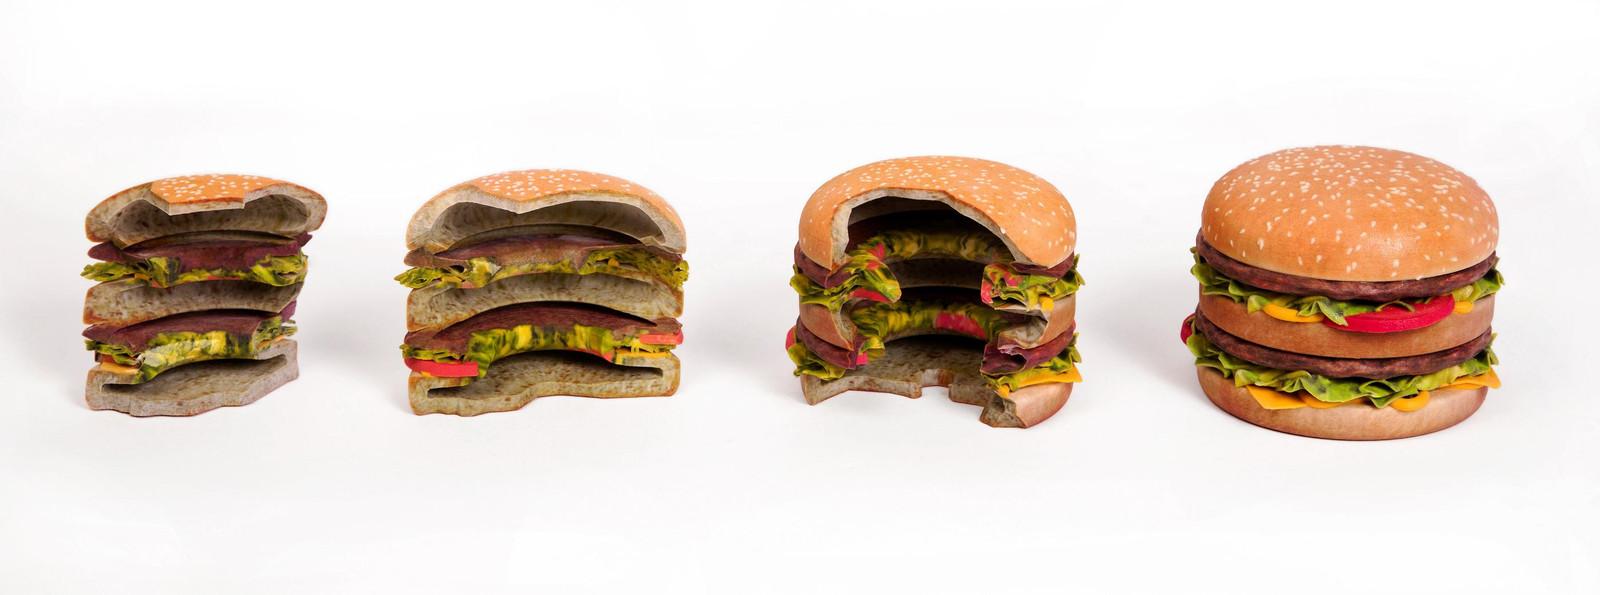 Voedselstillevens En Fooddesign Bij Mesdag Foto Ad Nl